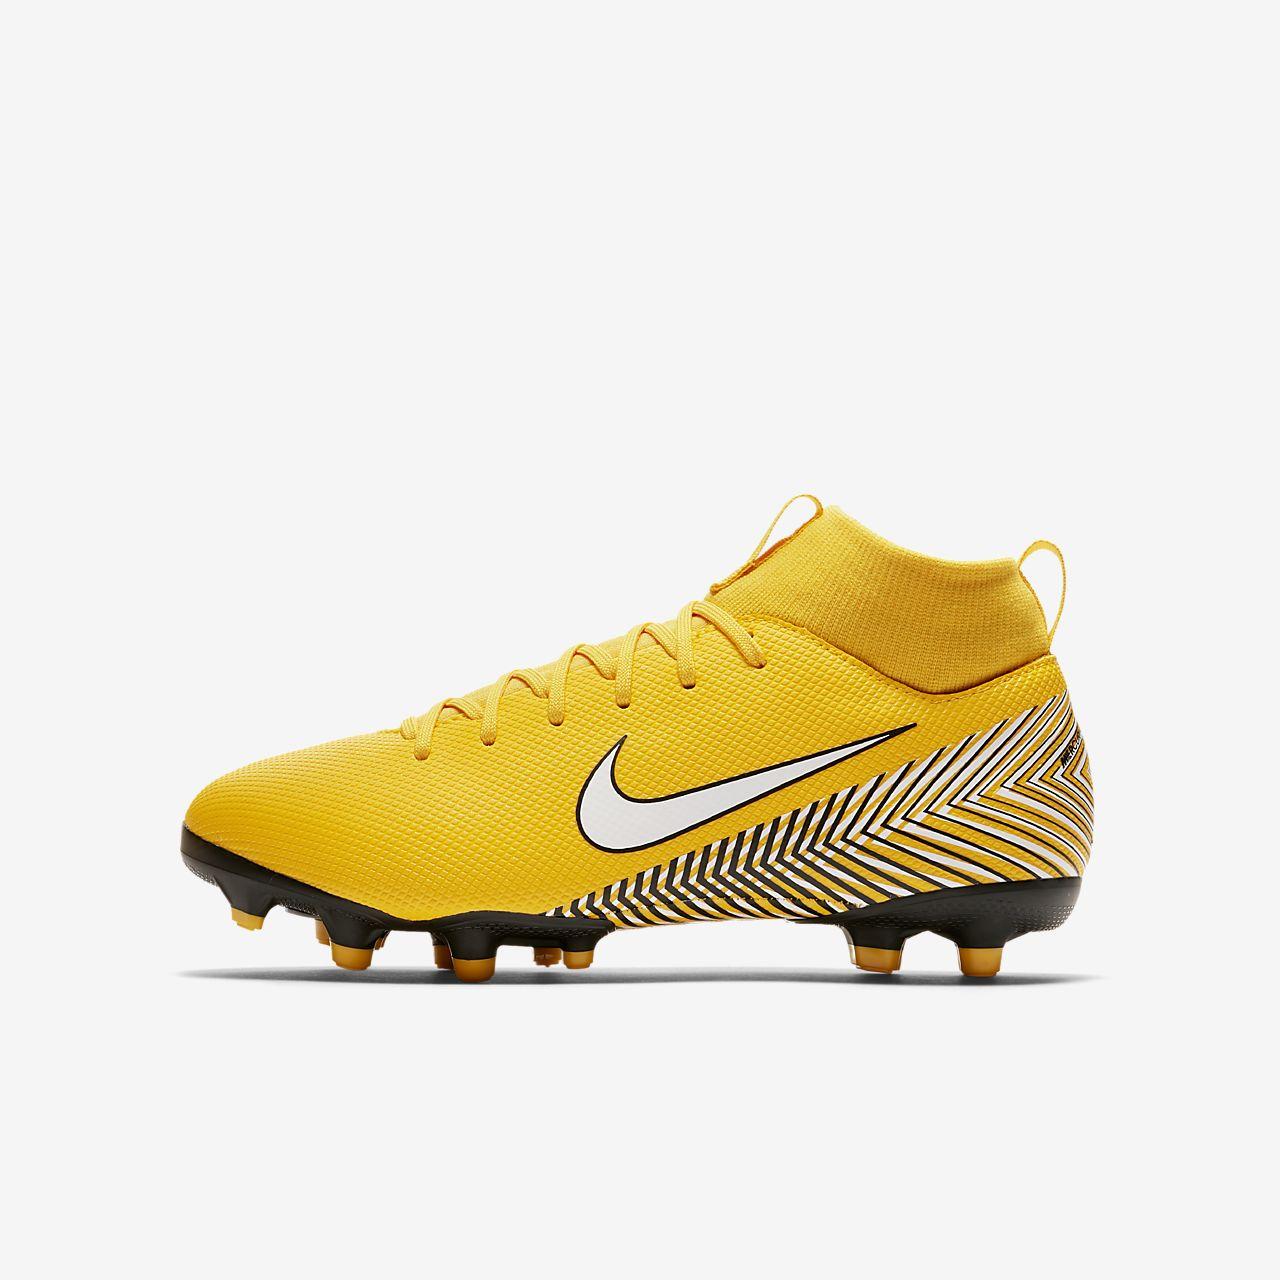 Scarpa da calcio multiterreno Nike Jr Academy Mercurial Superfly VI Academy Jr Neymar Jr. Bambini Ragazzi 92d087